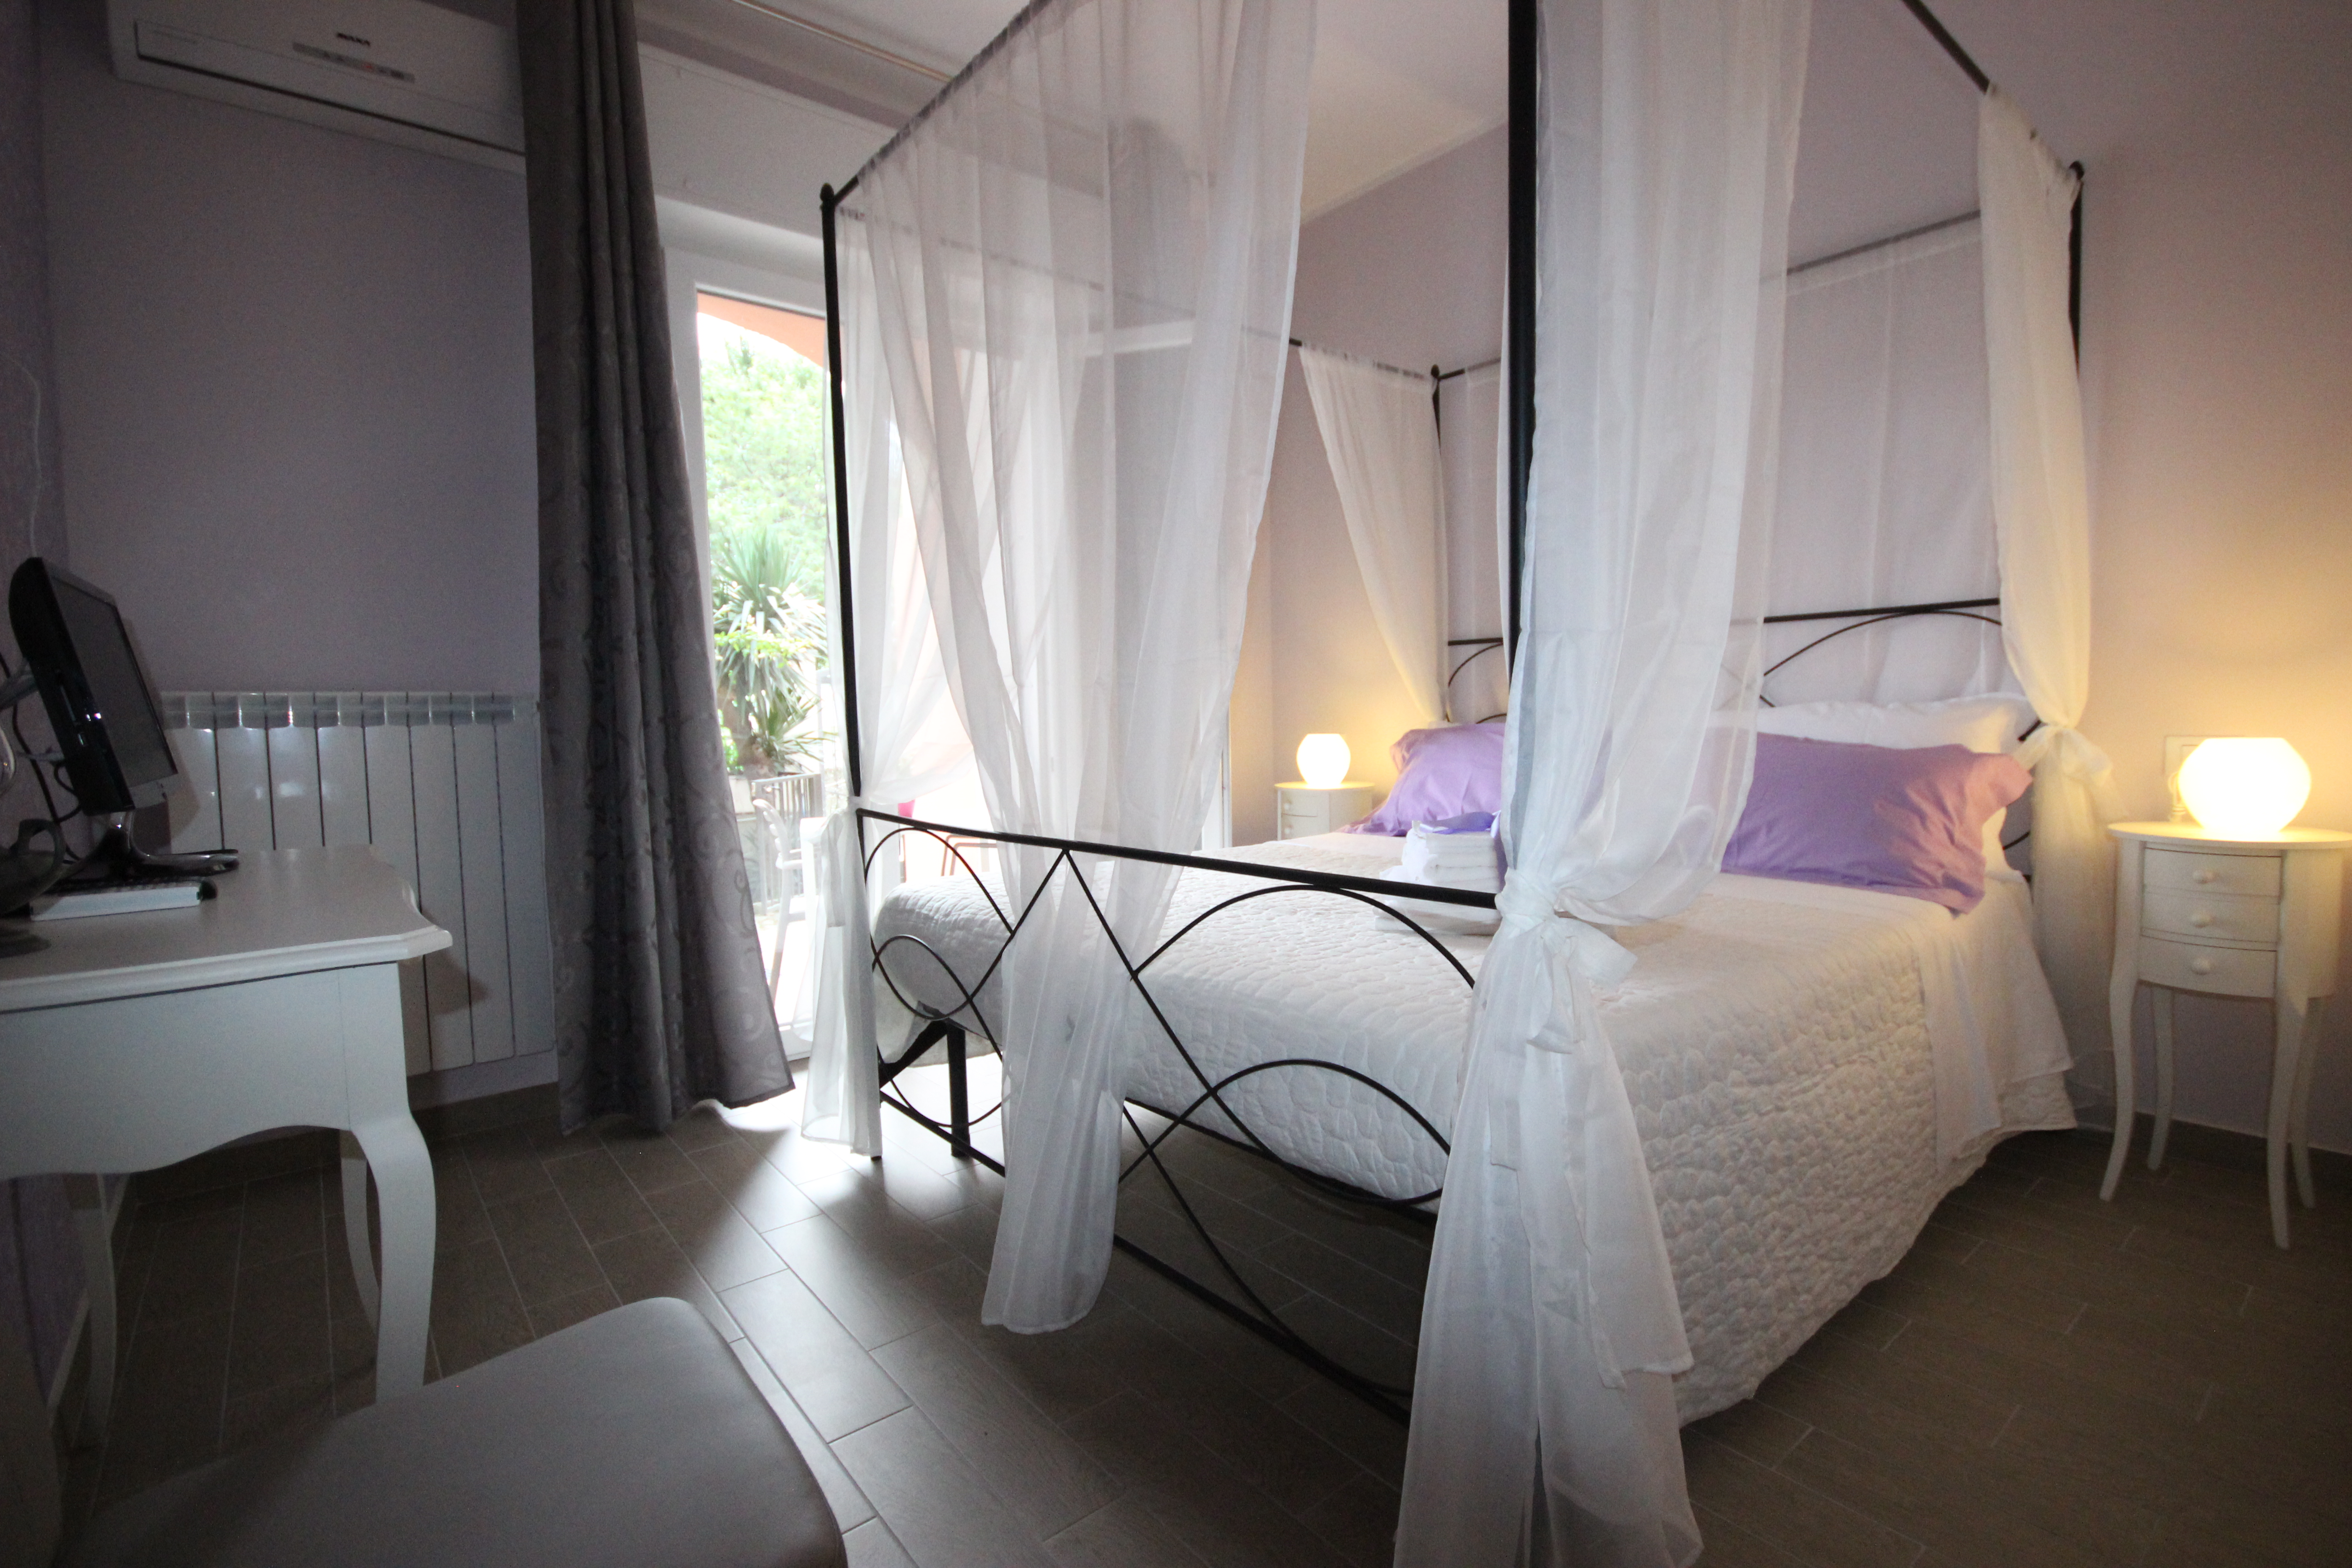 Bagni Blu Beach Vado Ligure : Viaggi e vacanze a vado ligure kijiji annunci di ebay